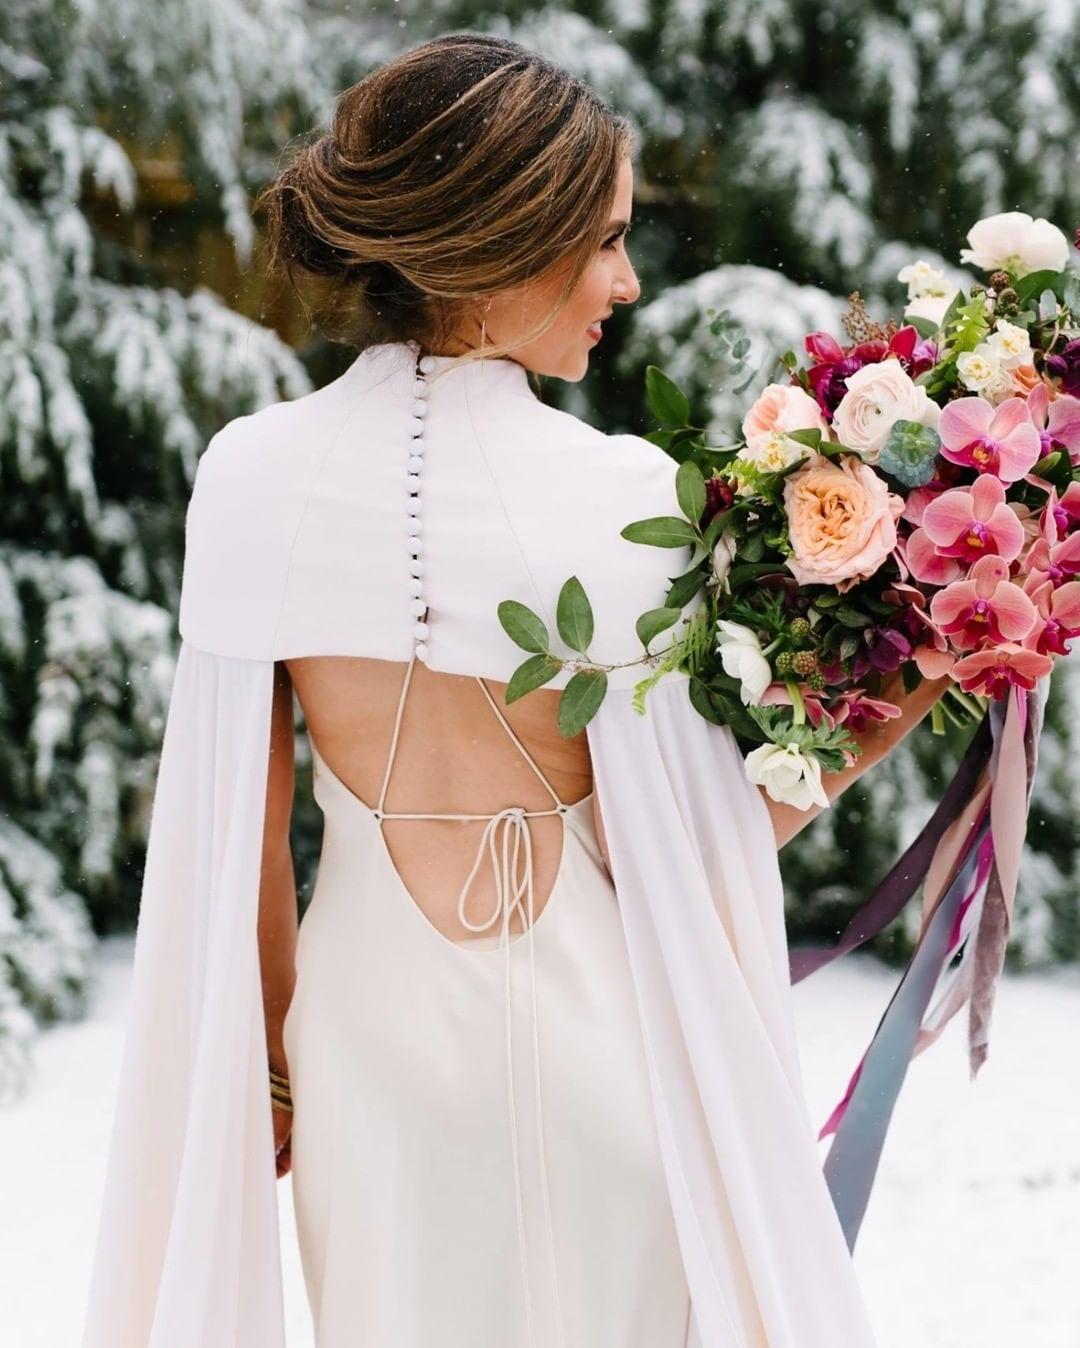 wedding dress cape | winter wedding ideas